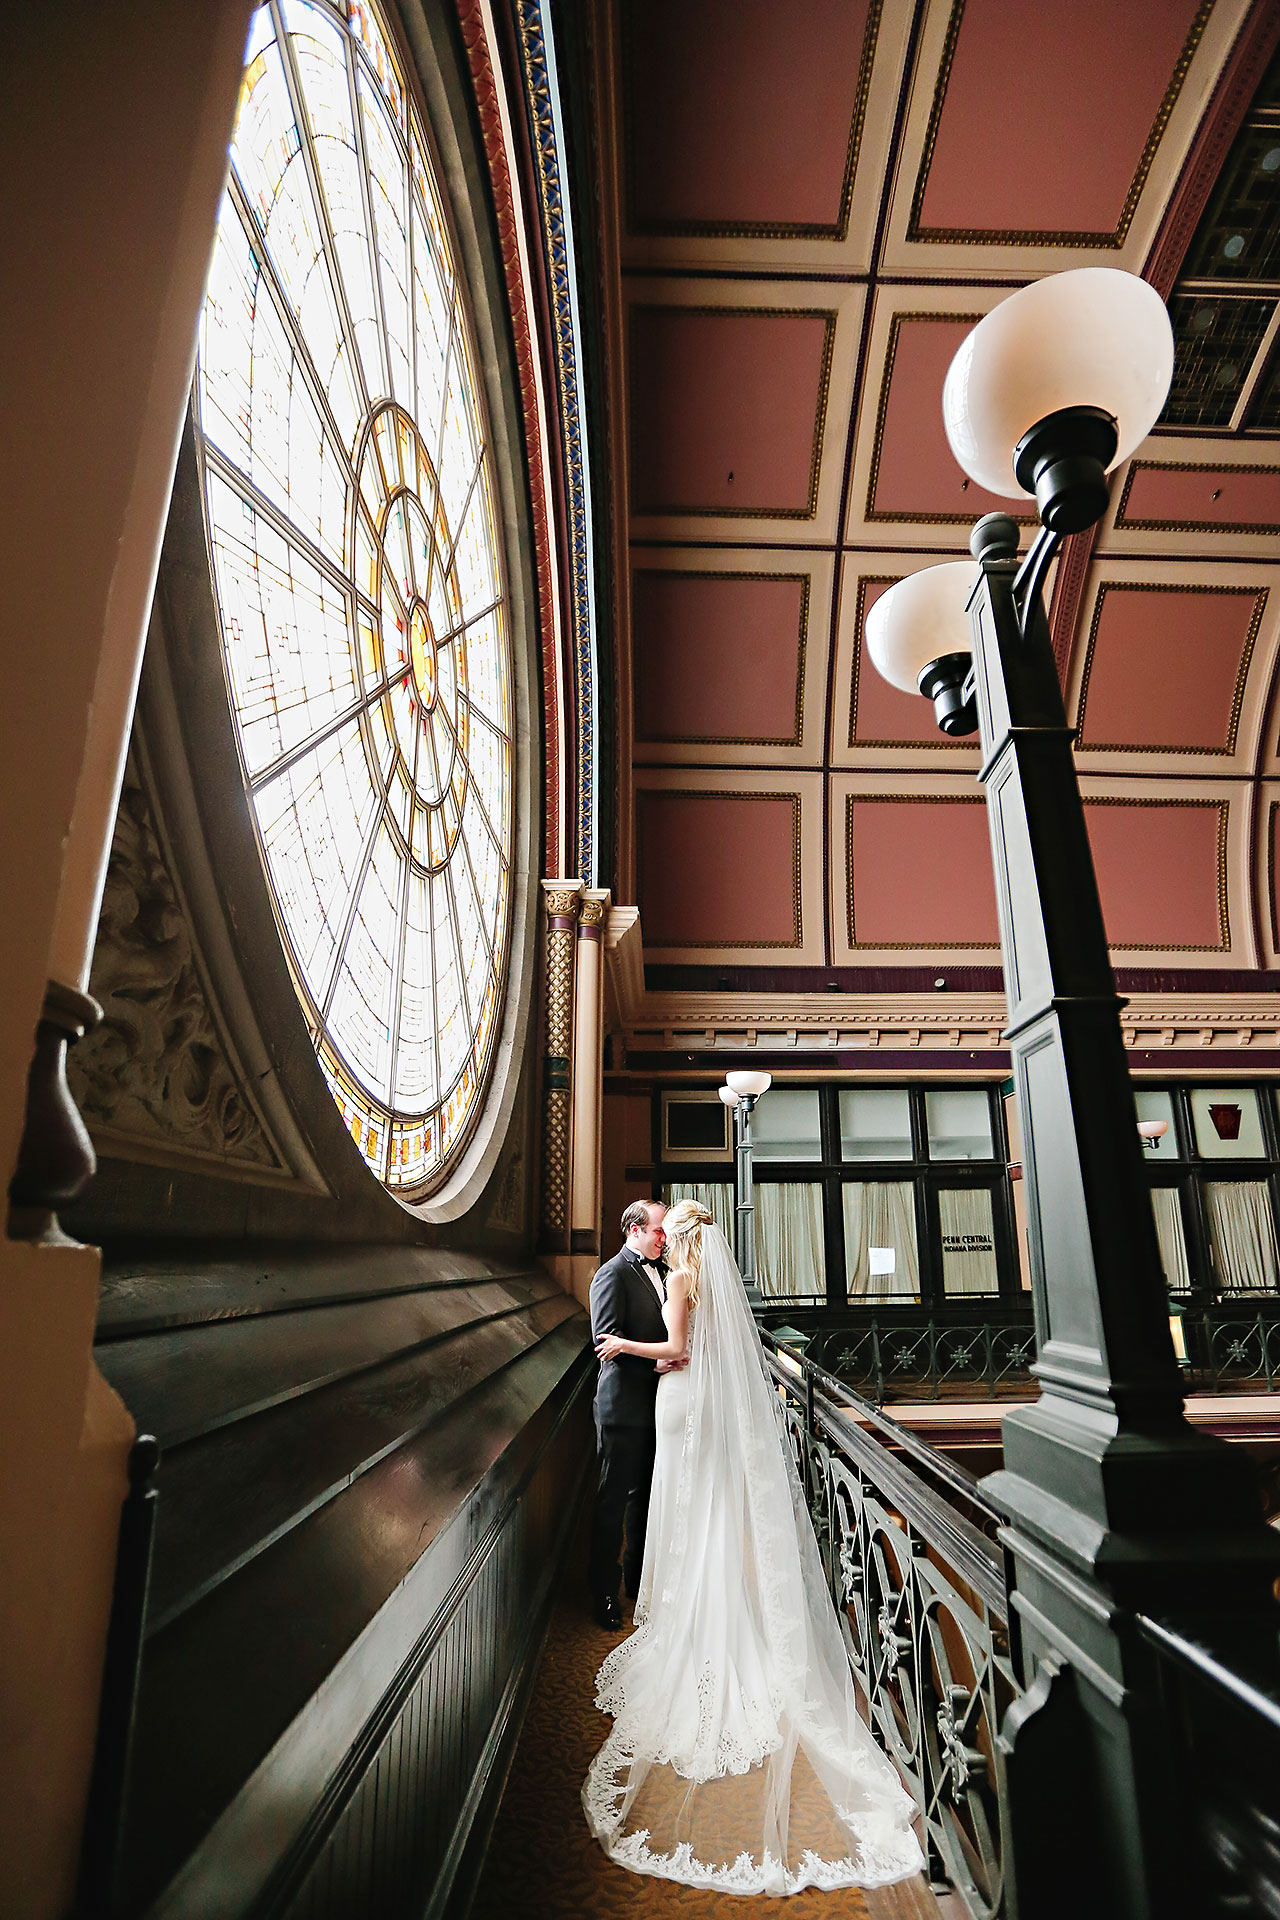 Allison Jeff Union Station Crowne Plaza Indianapolis wedding 062